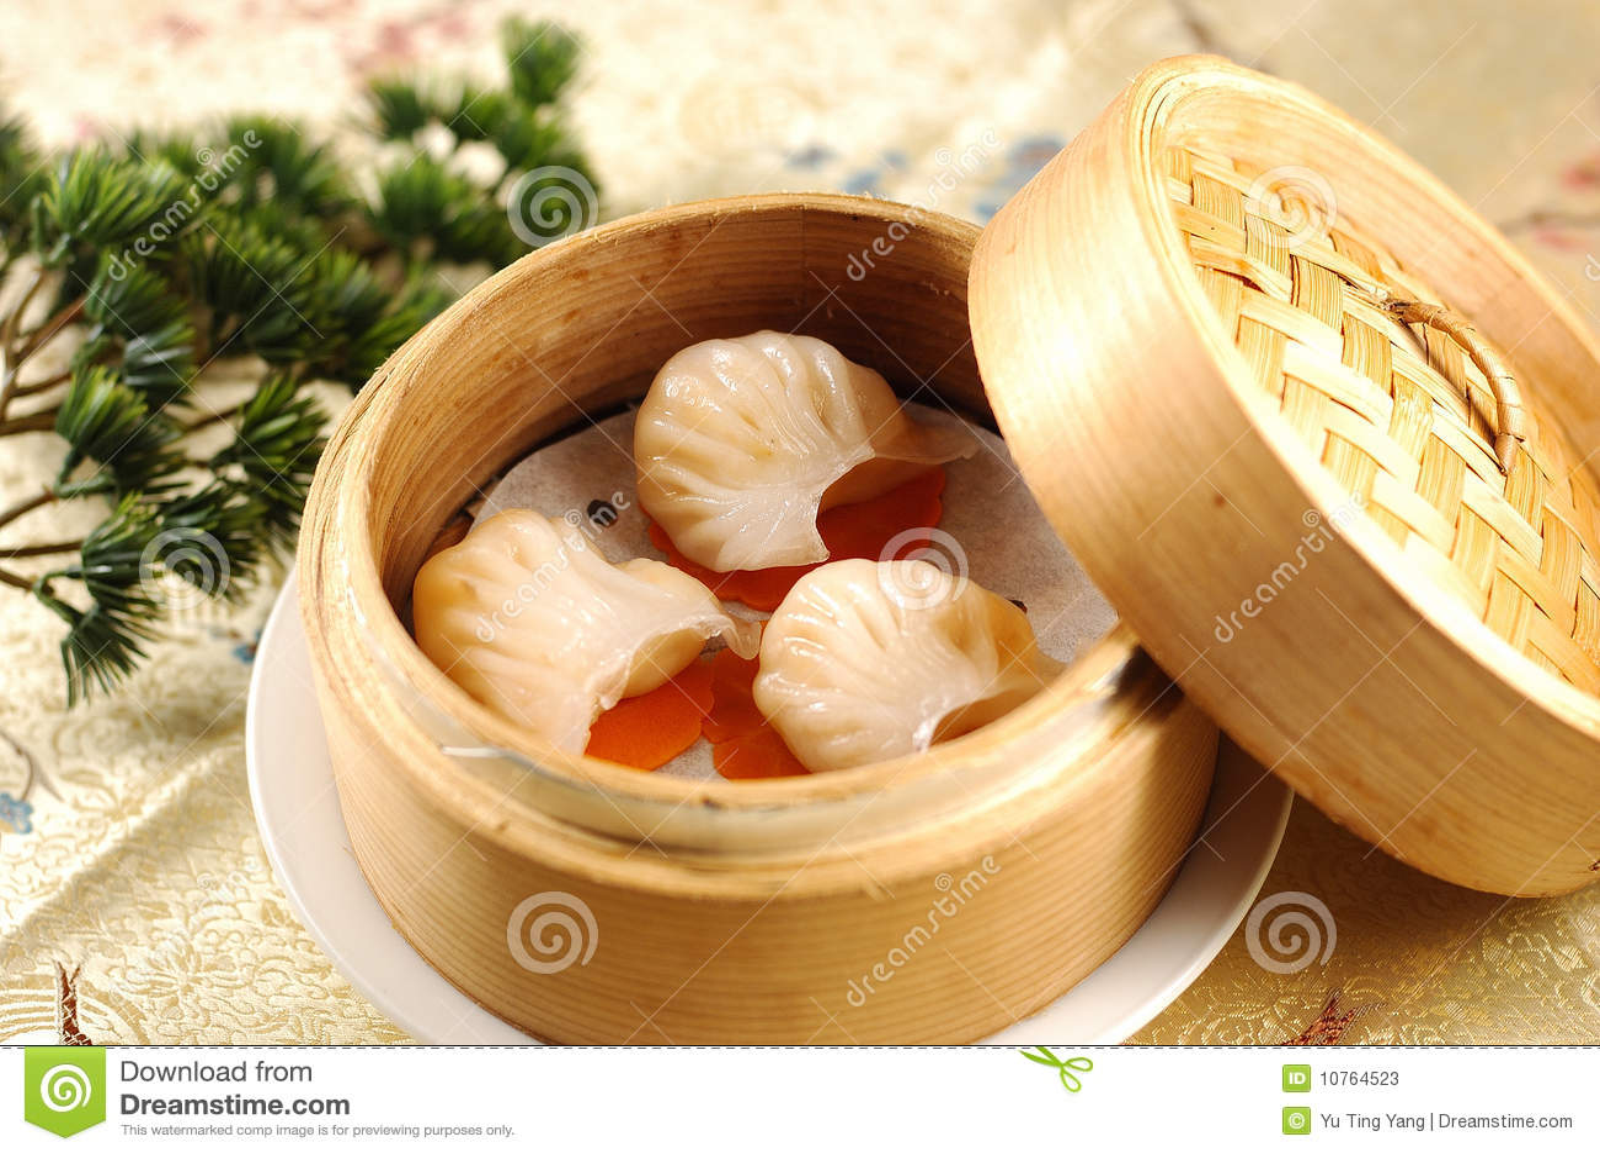 Hong Kong style Dim Sum Prawn Dumplings Stock Photos  : hong kong style dim sum prawn dumplings 10764523 from www.dreamstime.com size 1300 x 954 jpeg 177kB